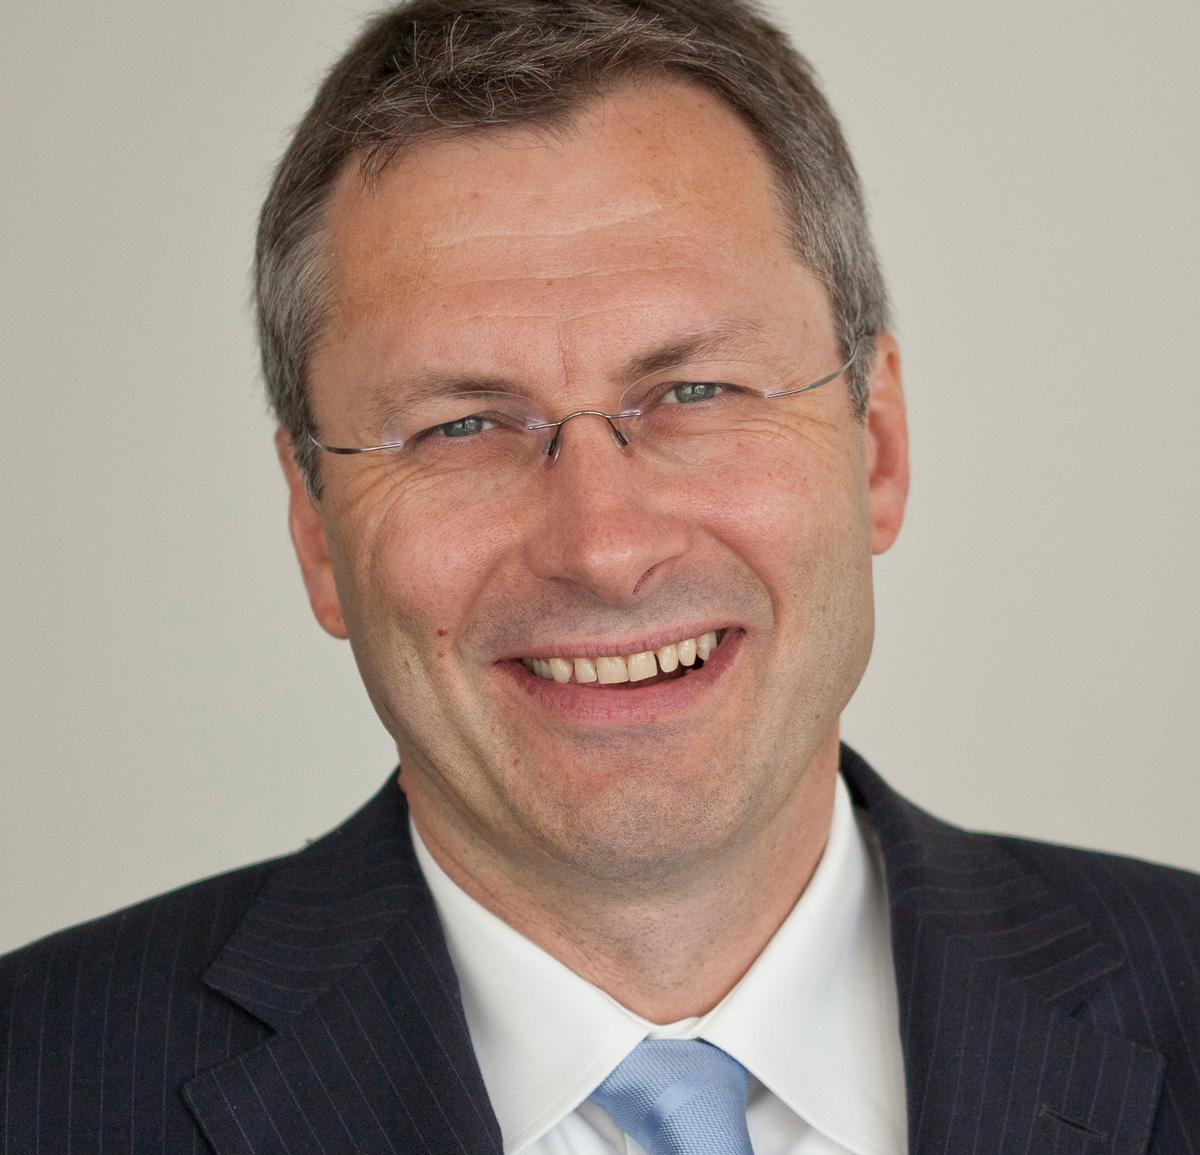 Marcel Walker übernimmt Cloud-Verantwortung bei Swisscom - Marcel_Walker_140625_100613